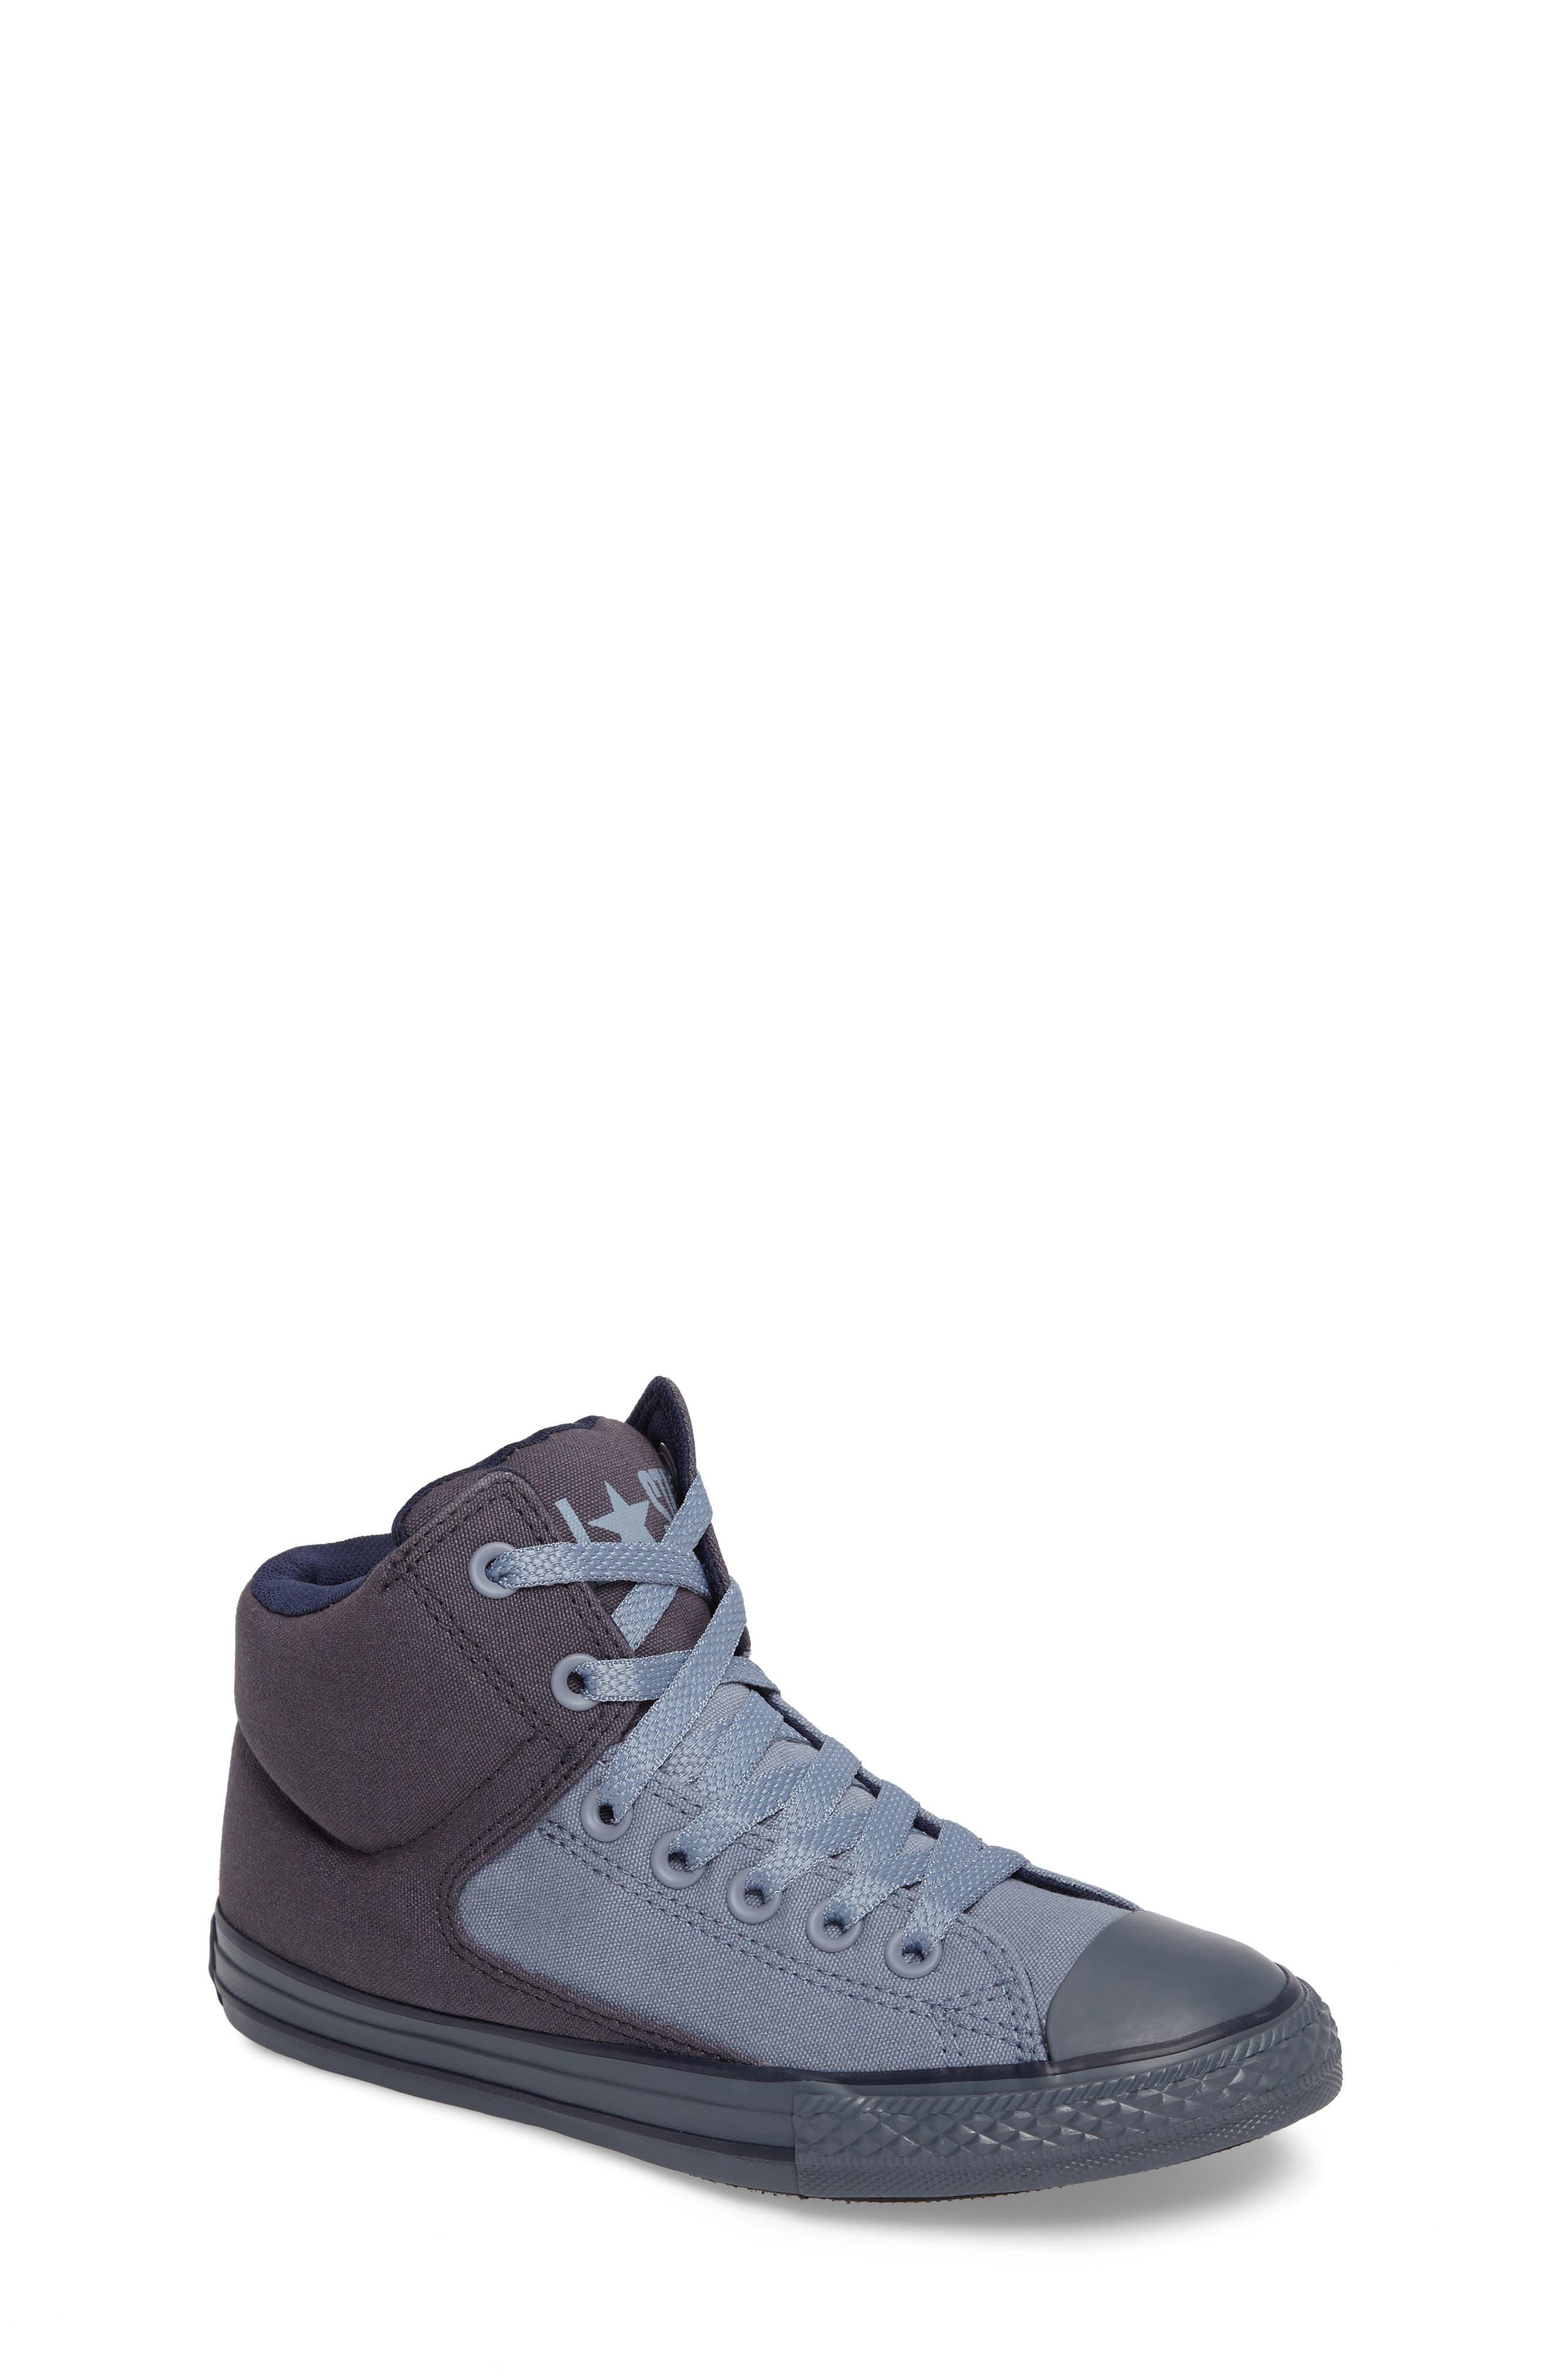 CONVERSE Chuck Taylor<sup>®</sup> All Star<sup>®</sup> High Street High Top Sneaker